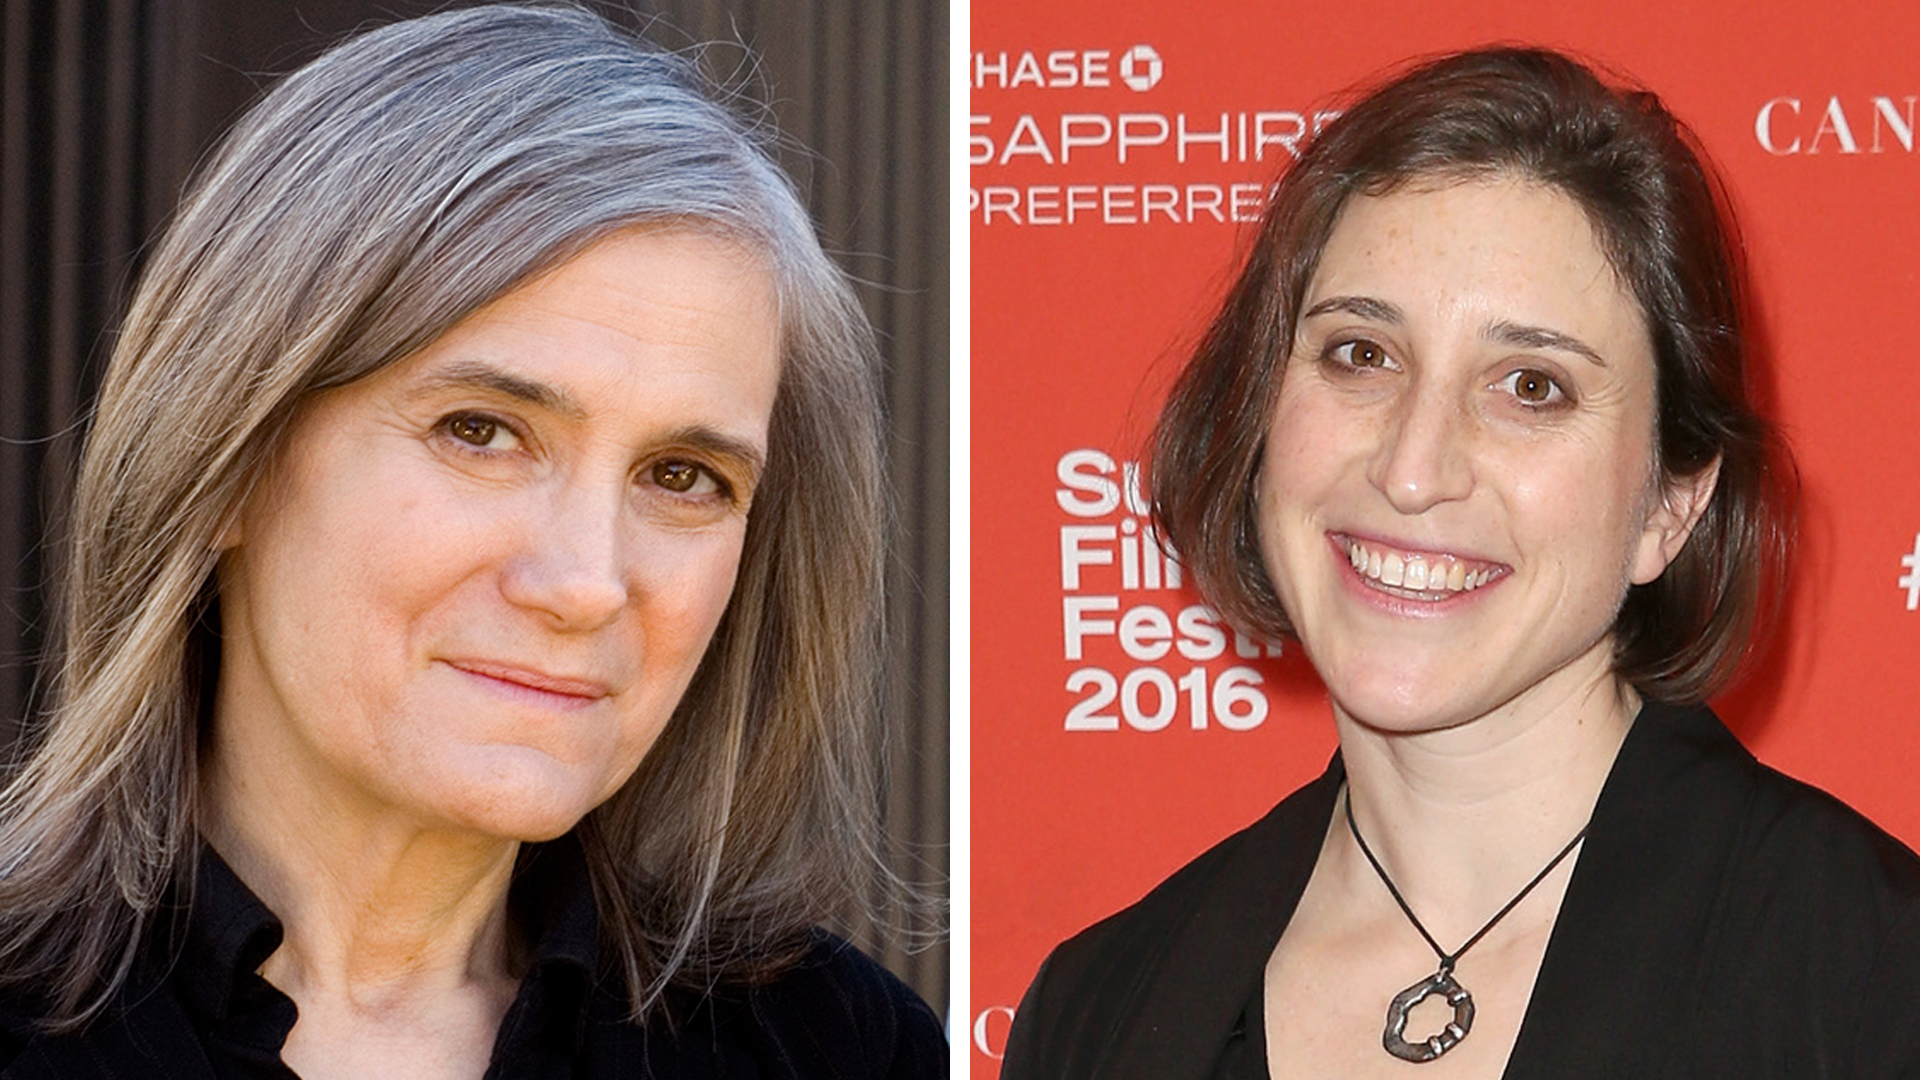 Left: Amy Goodman (Photo: Democracy Now!) Right: Deia Schlosberg (Phillip Faraone/Getty Images for Sundance Film Festival)